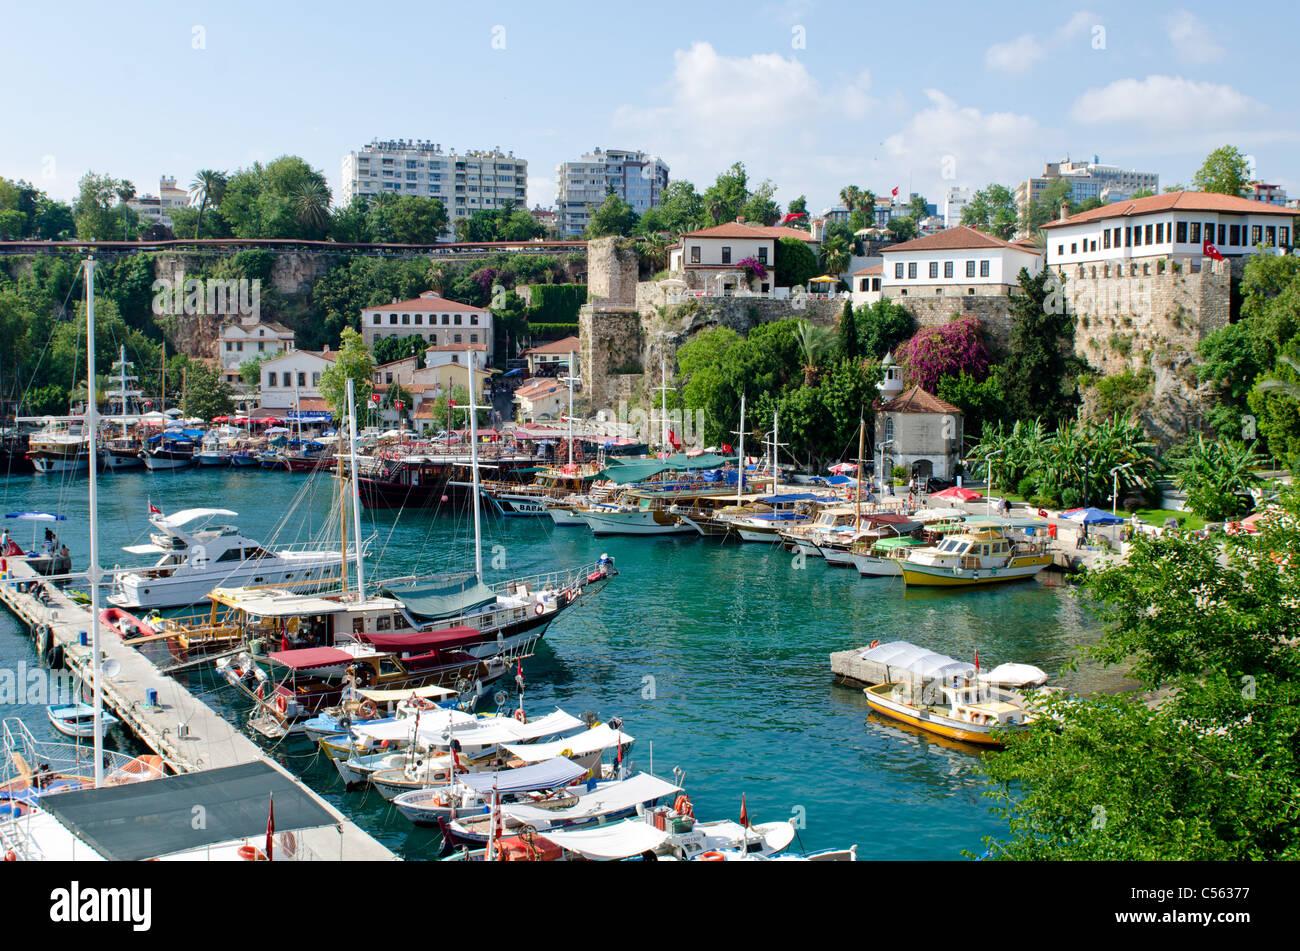 Antalya harbor Turkey - Stock Image